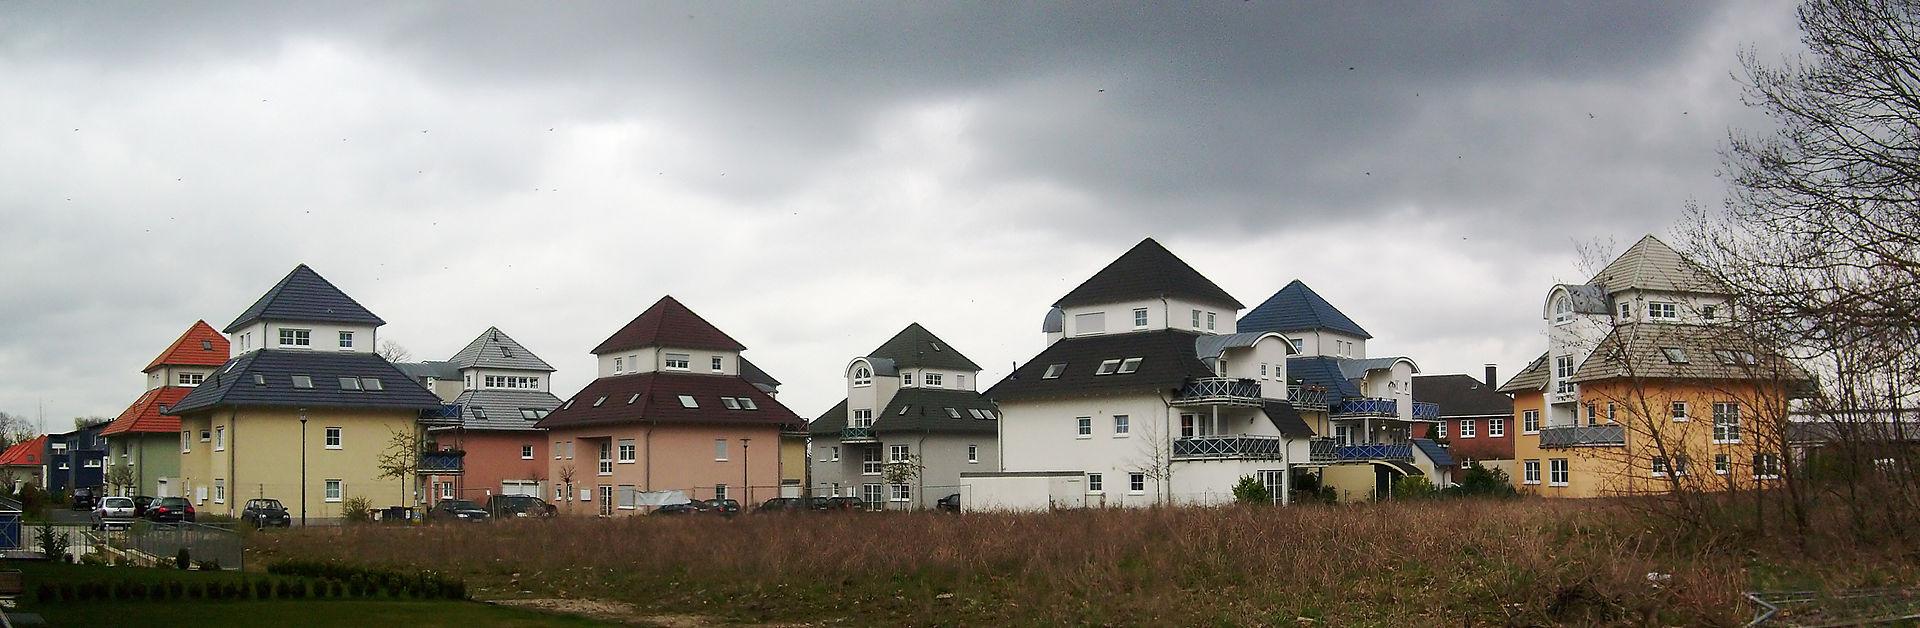 Bild Stadtkrone Ost Dortmund